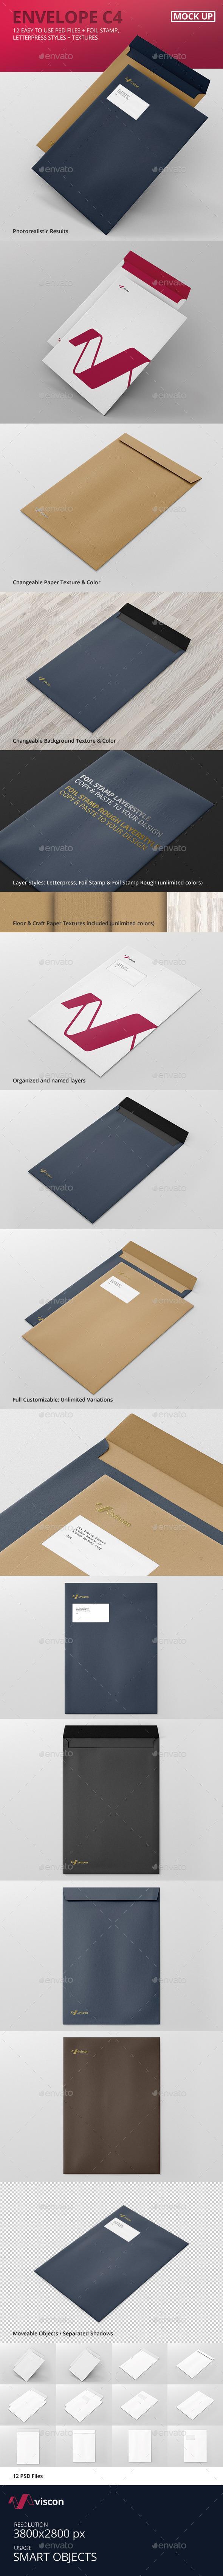 Envelope C4 Mock-Ups (Stationery)